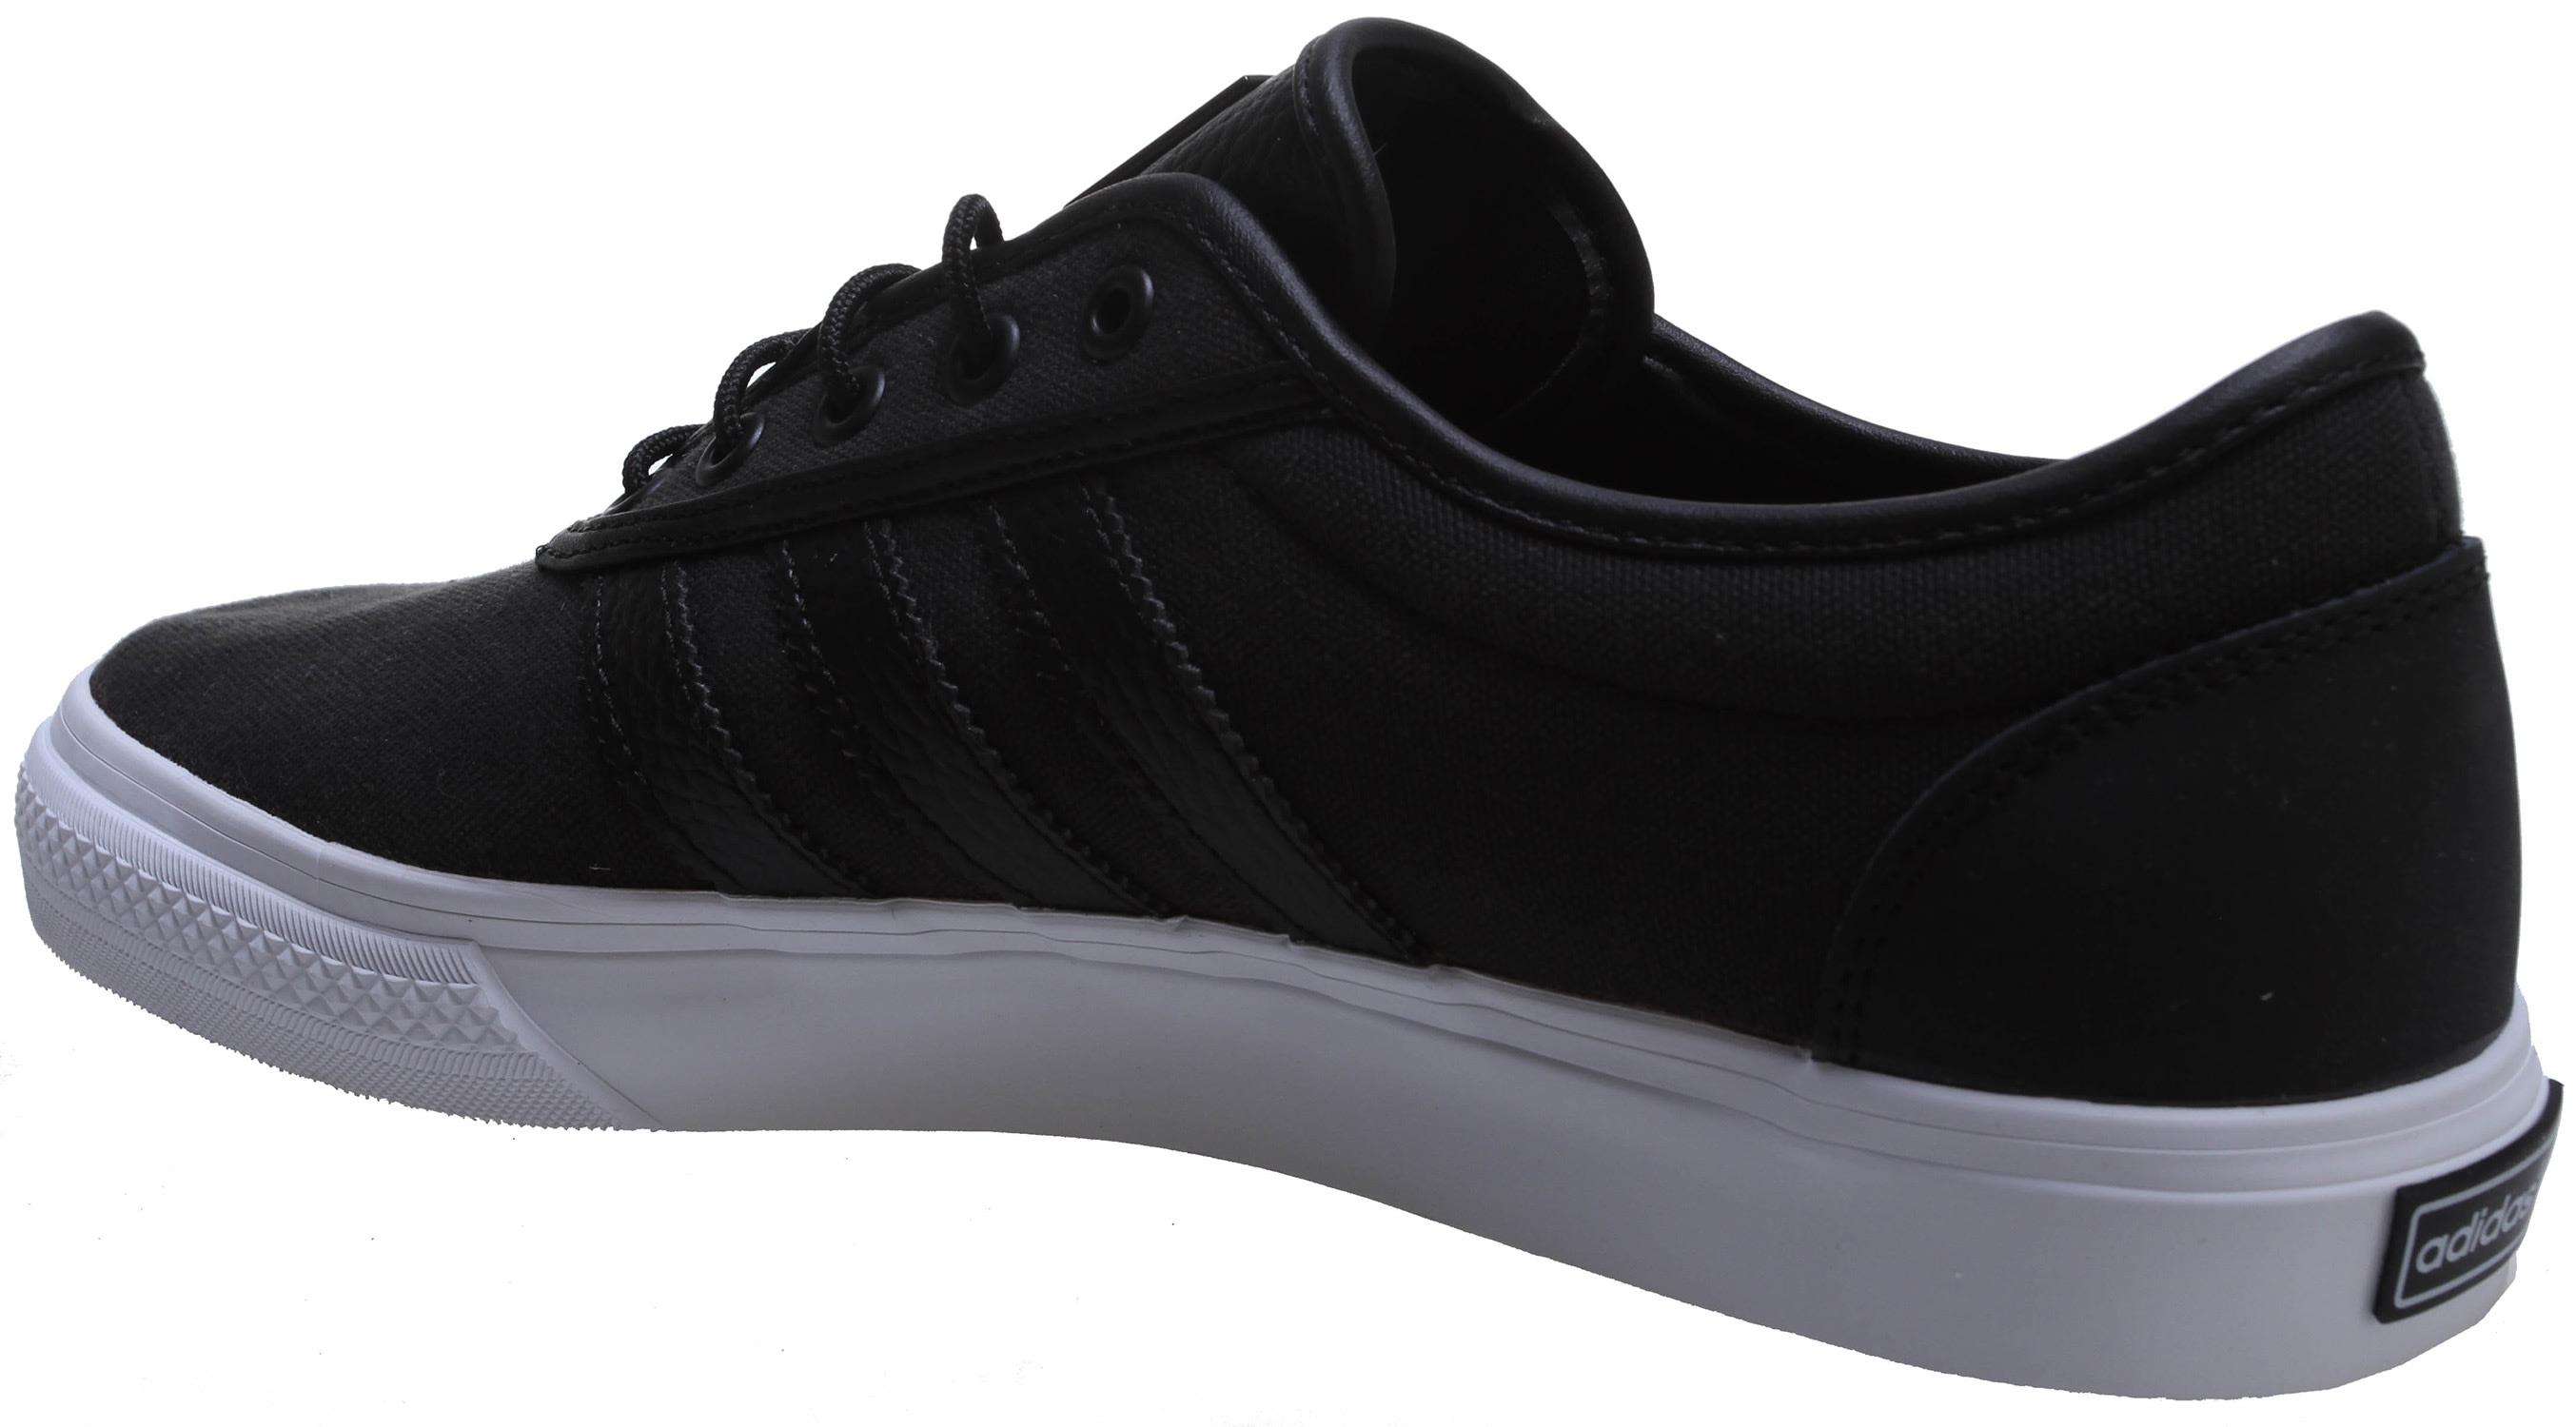 newest 7fe49 2b548 Adidas Adi-Ease Classified Skate Shoes - thumbnail 3